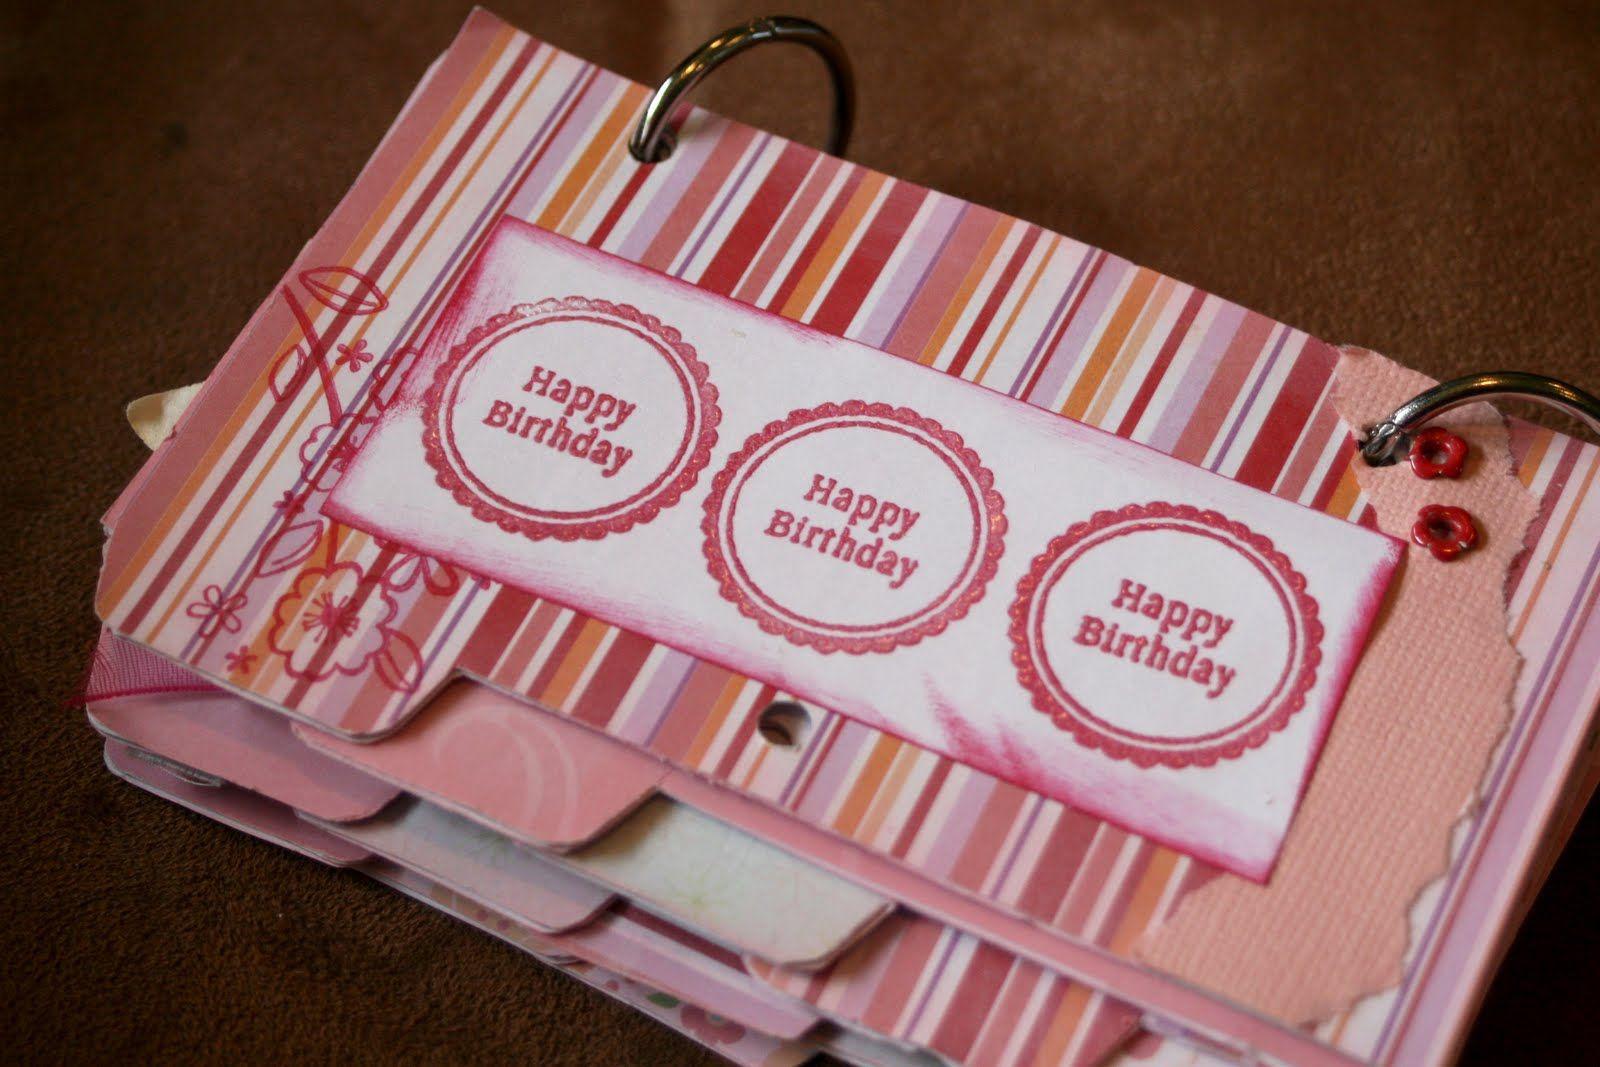 On My Side of the Room: Recipe Card Birthday Calendar